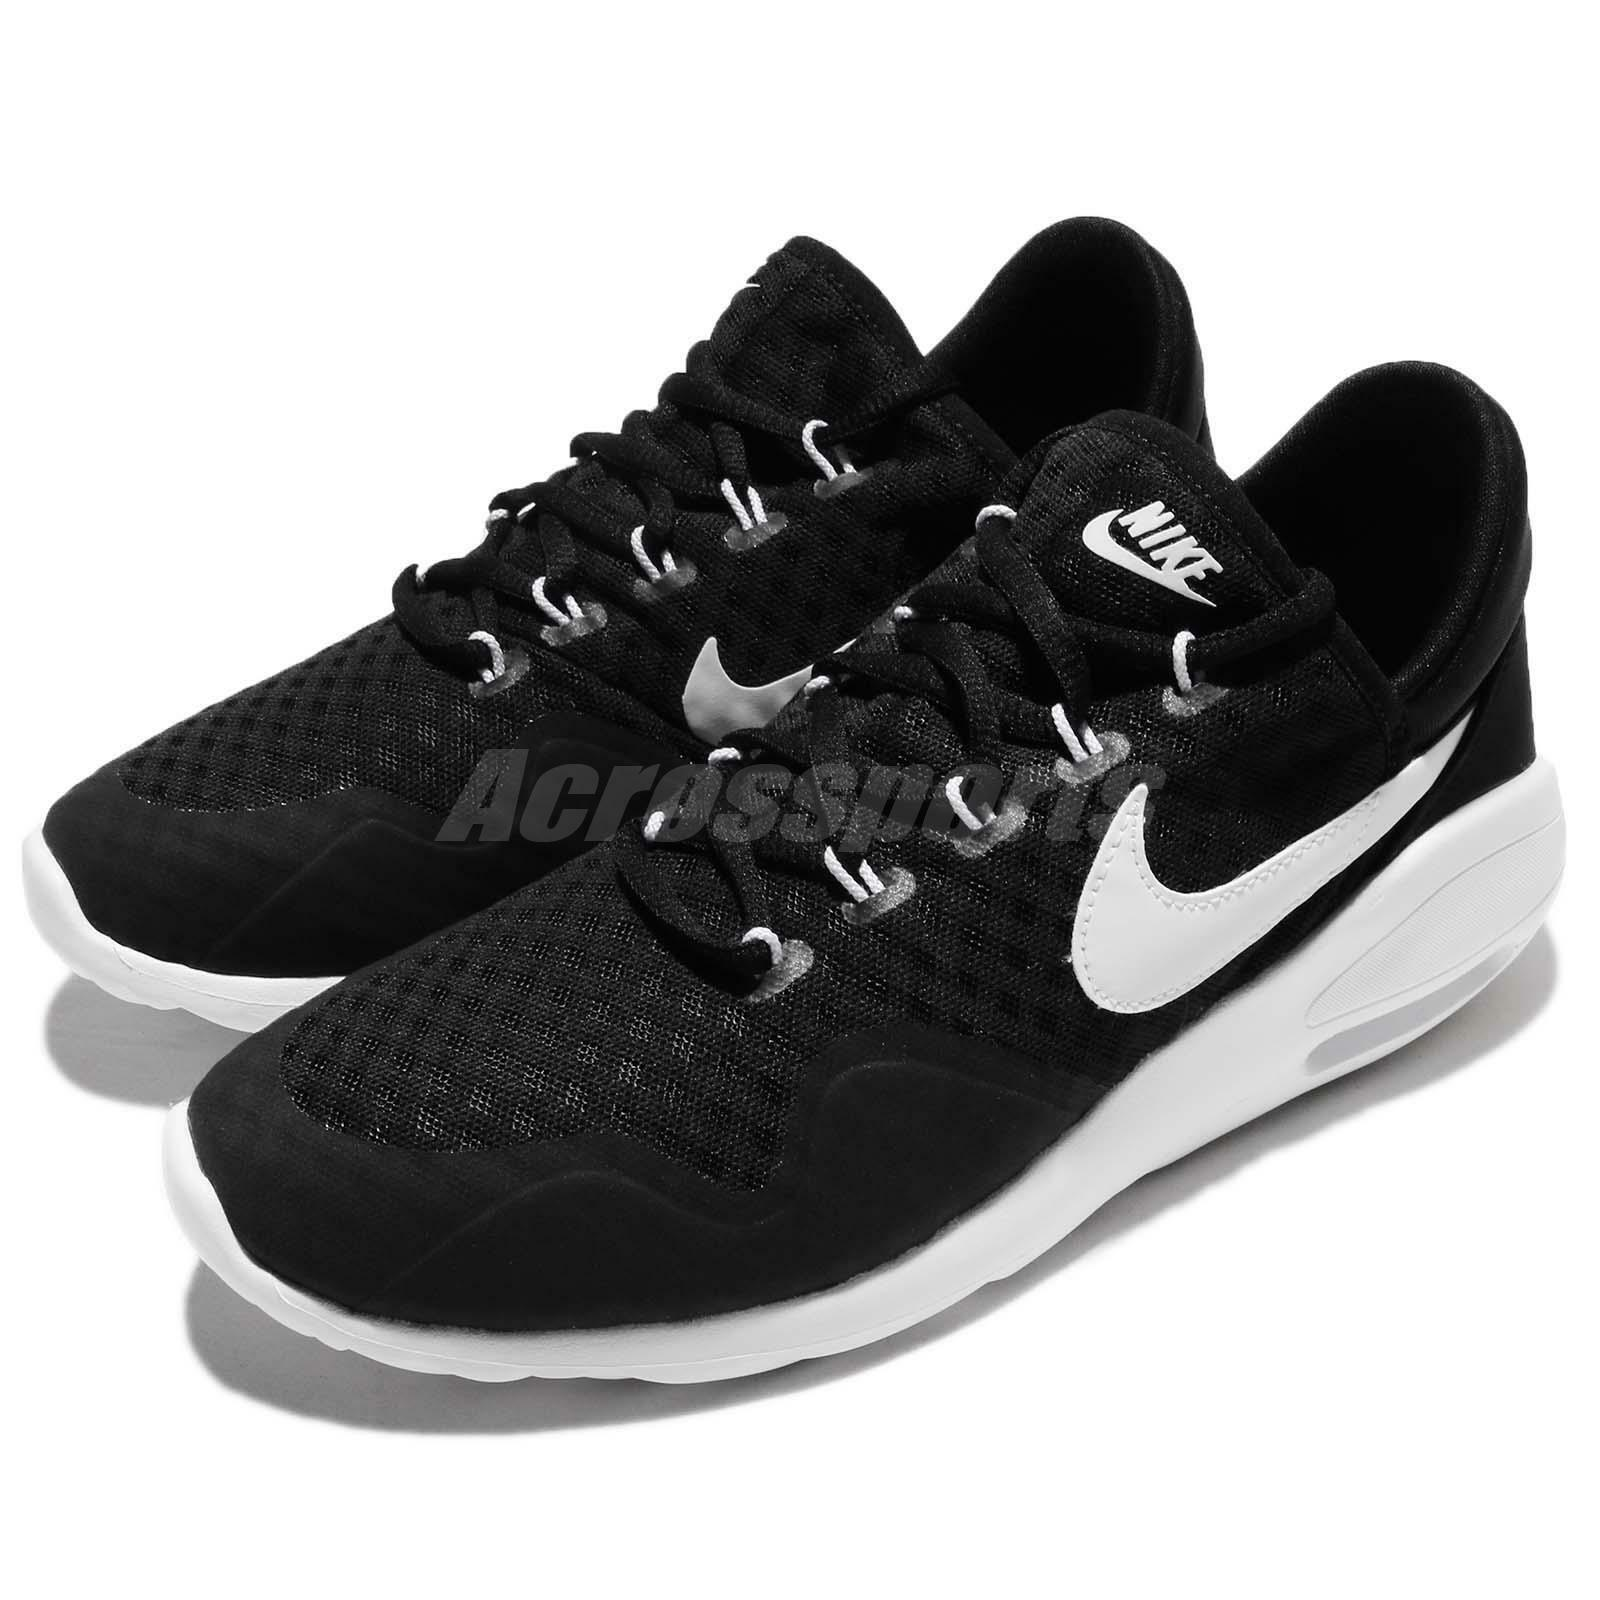 Wmns Nike Zapatillas Air Max Sasha Negro blancoo Zapatos